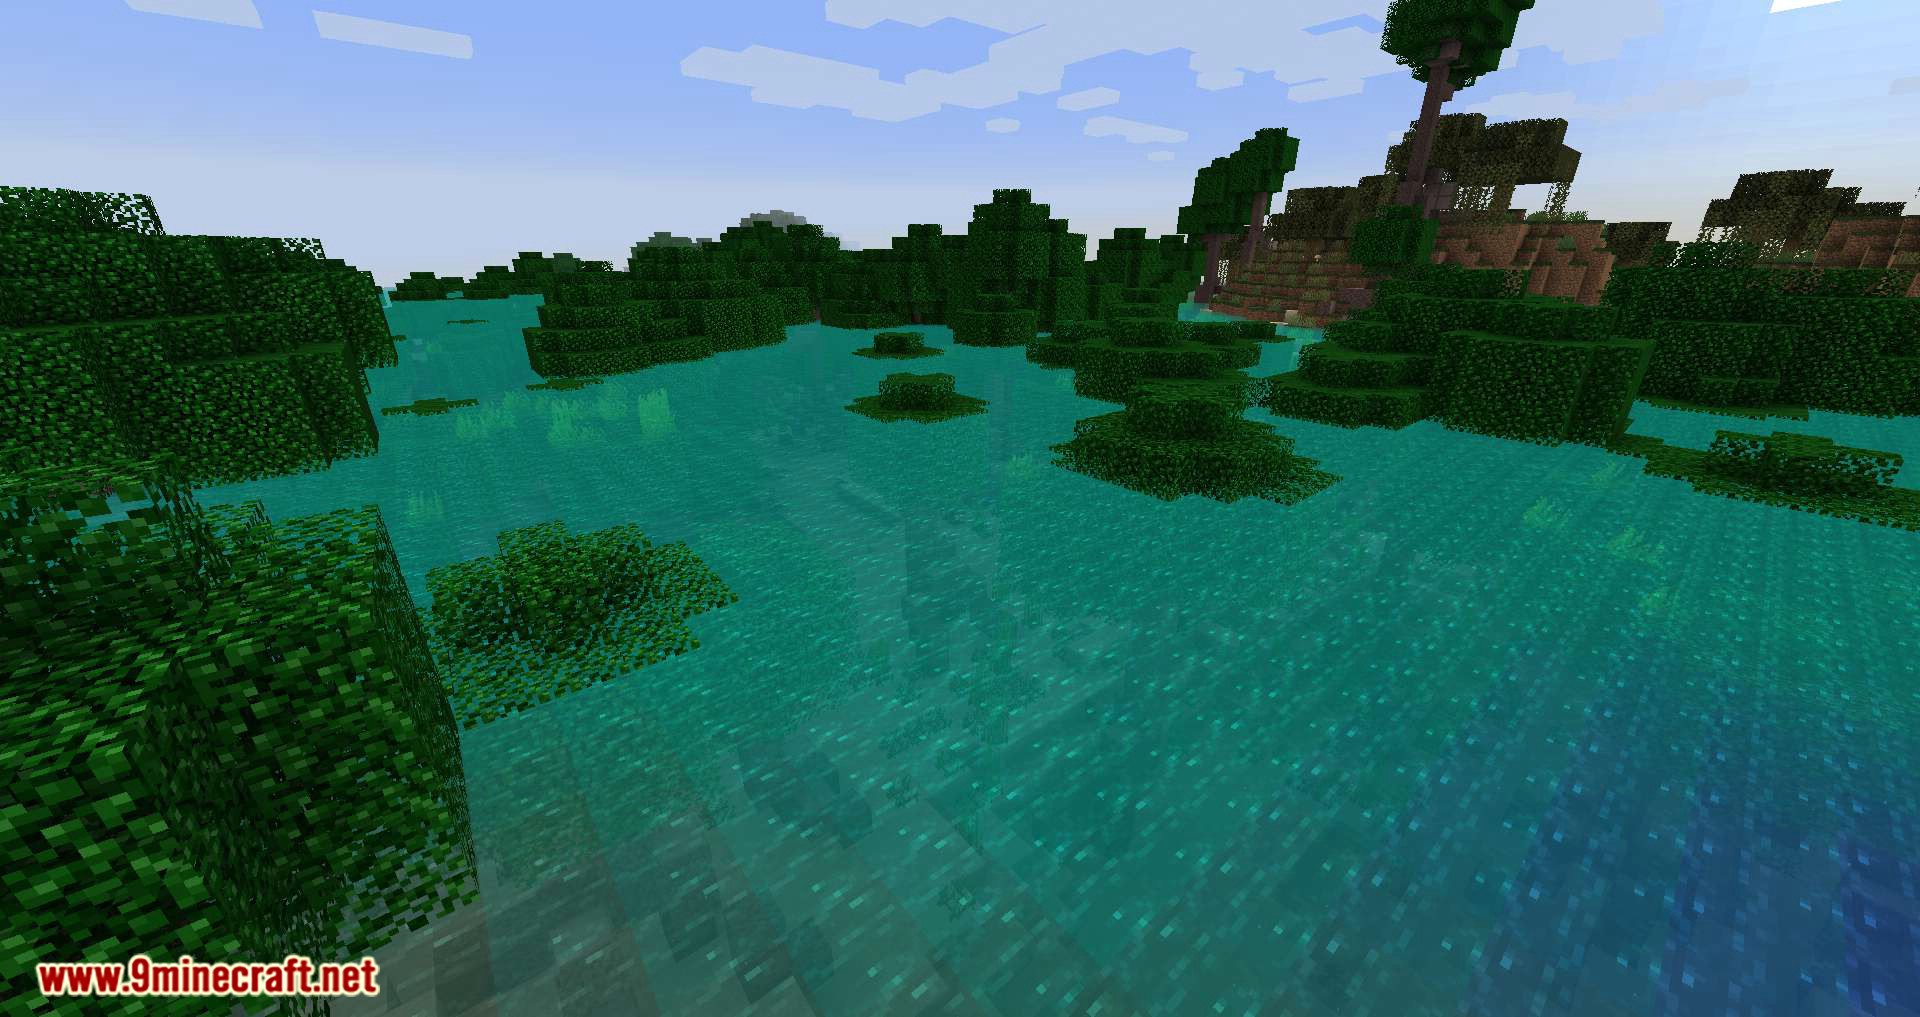 underwater biome mod minecraft ocean biomes 9minecraft torch tech features tree source screenshots